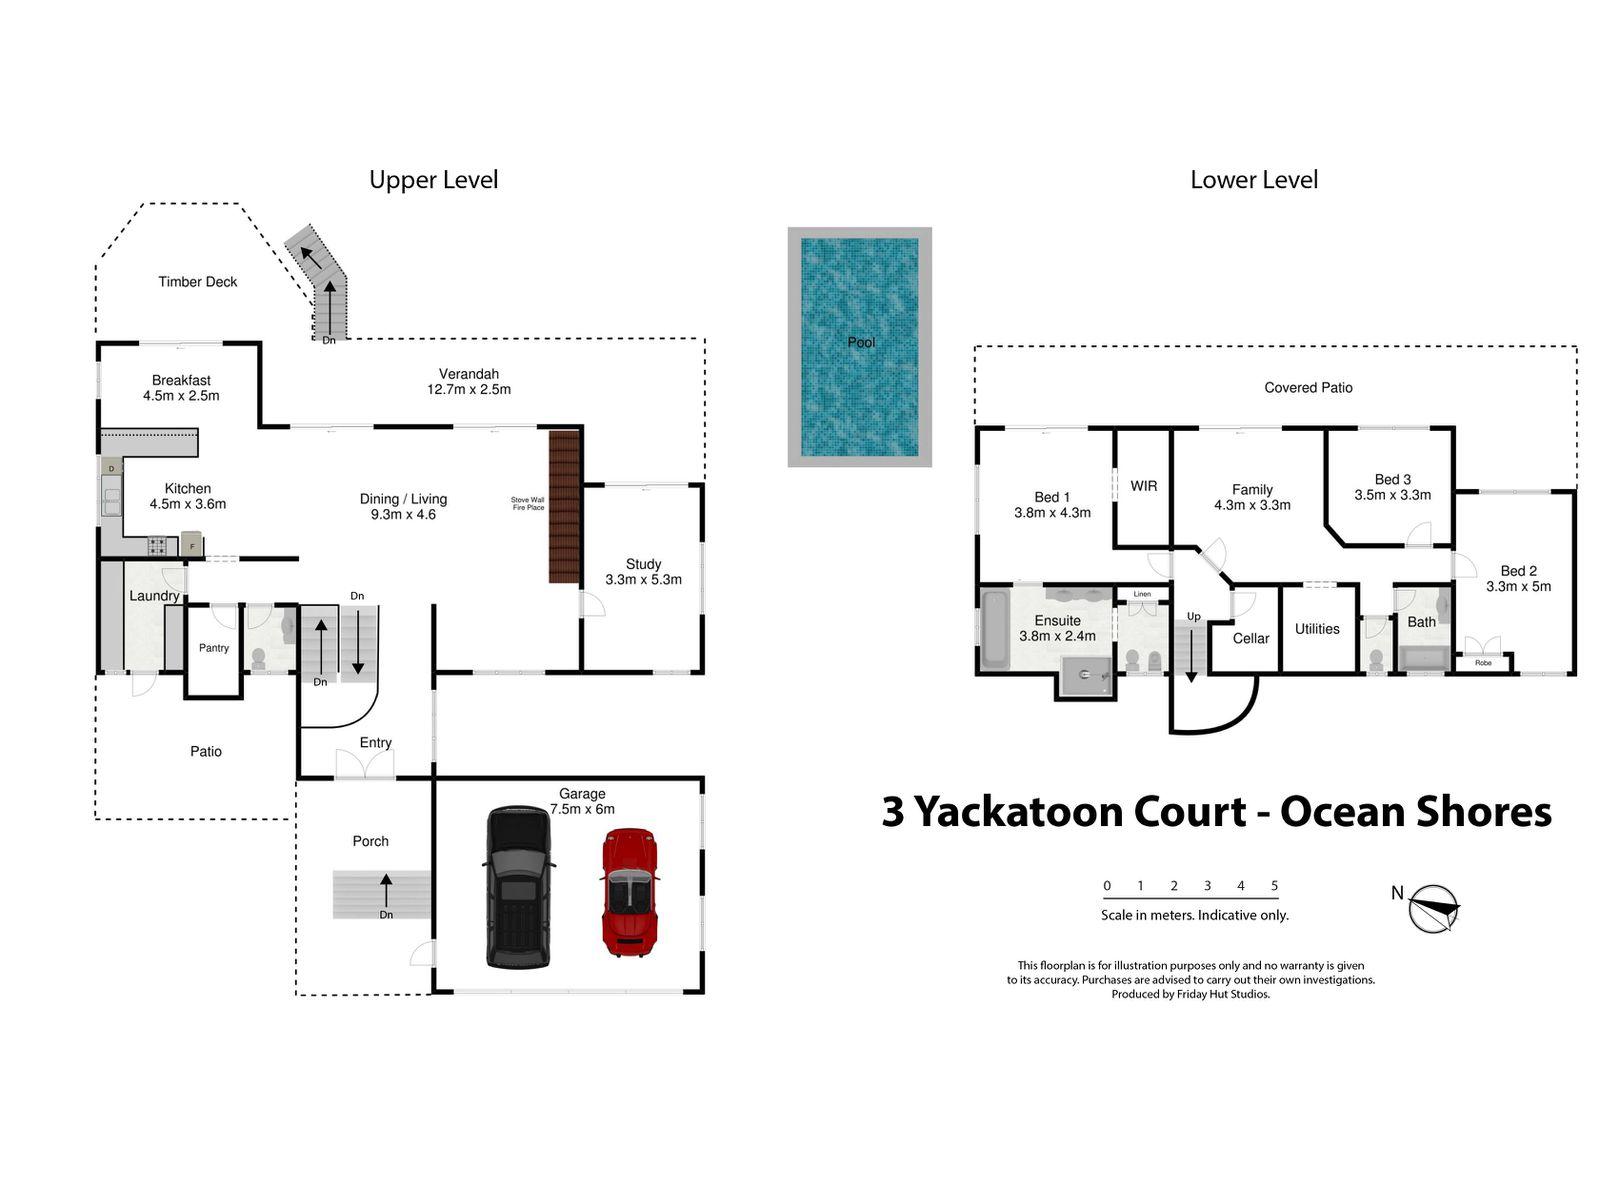 3 Yackatoon Court, Ocean Shores